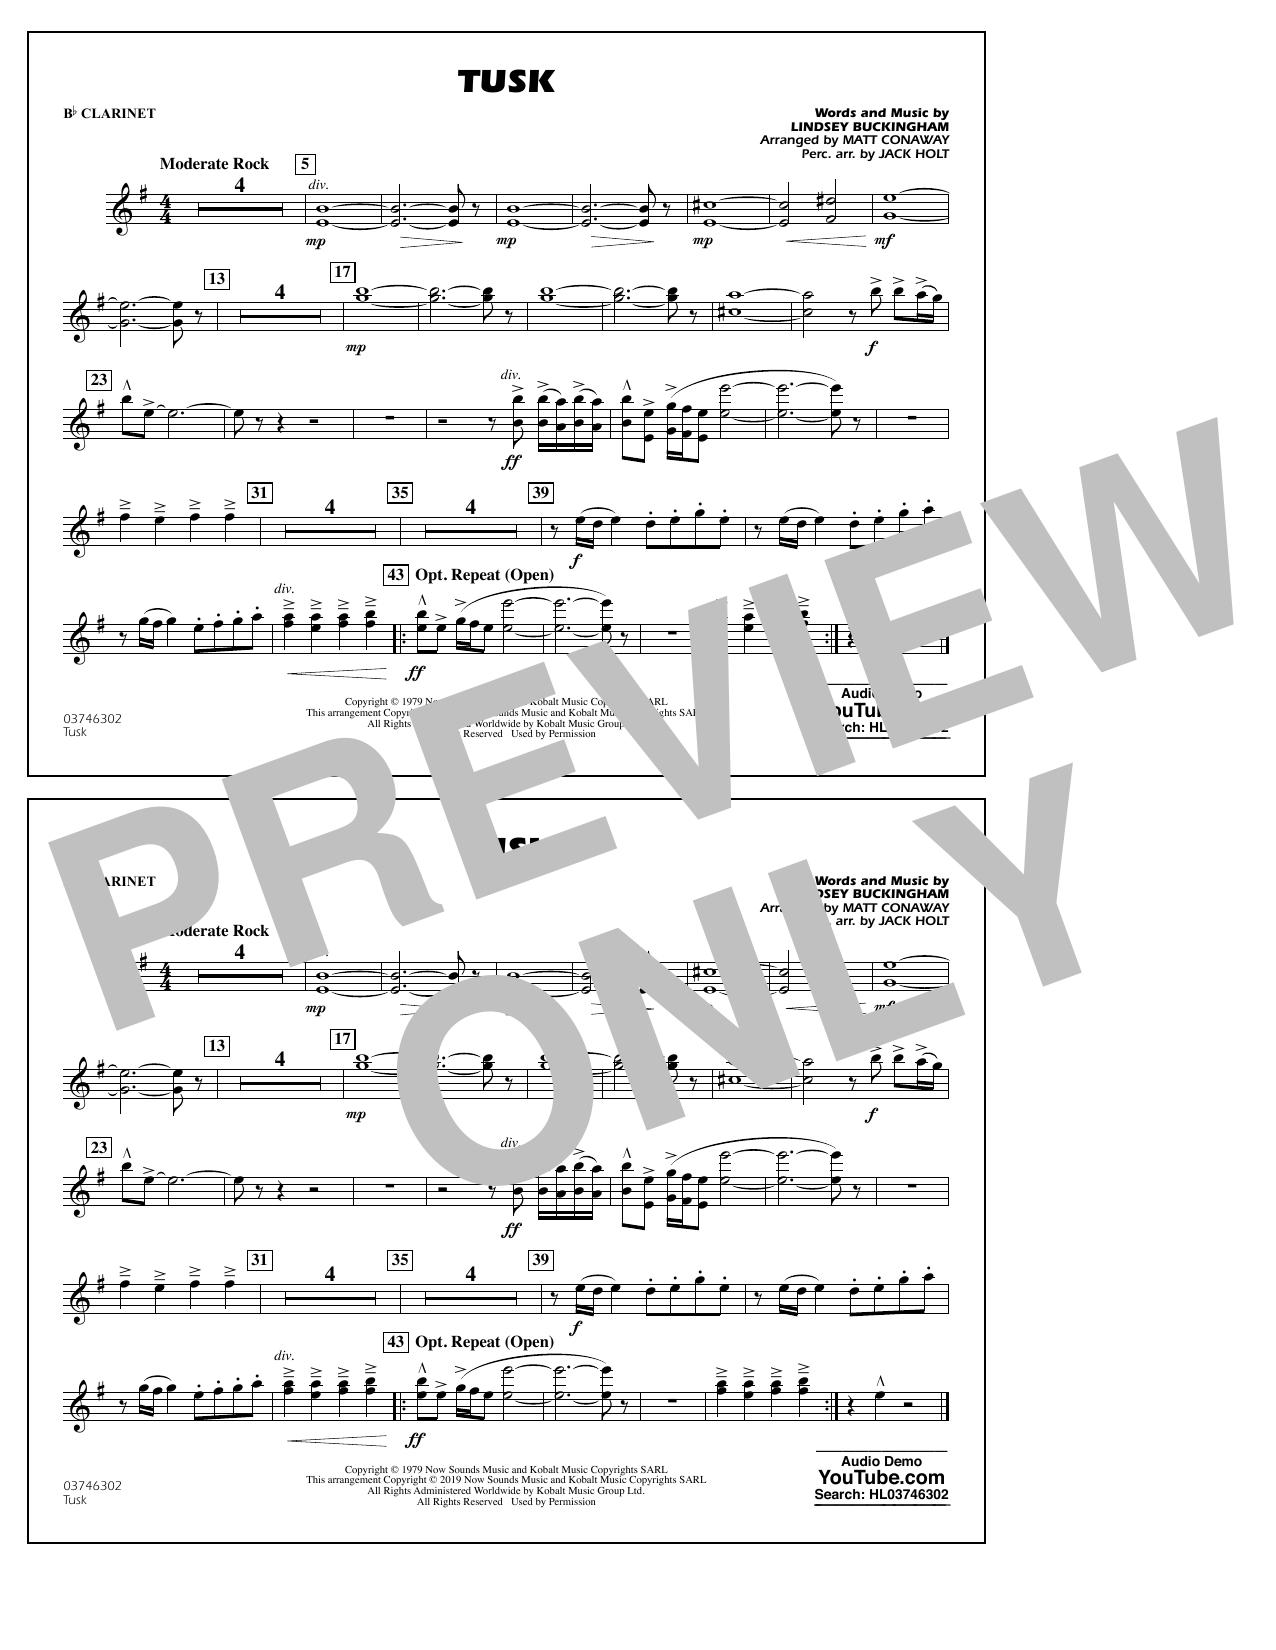 Fleetwood Mac Tusk (arr. Matt Conaway) - Bb Clarinet sheet music notes and chords